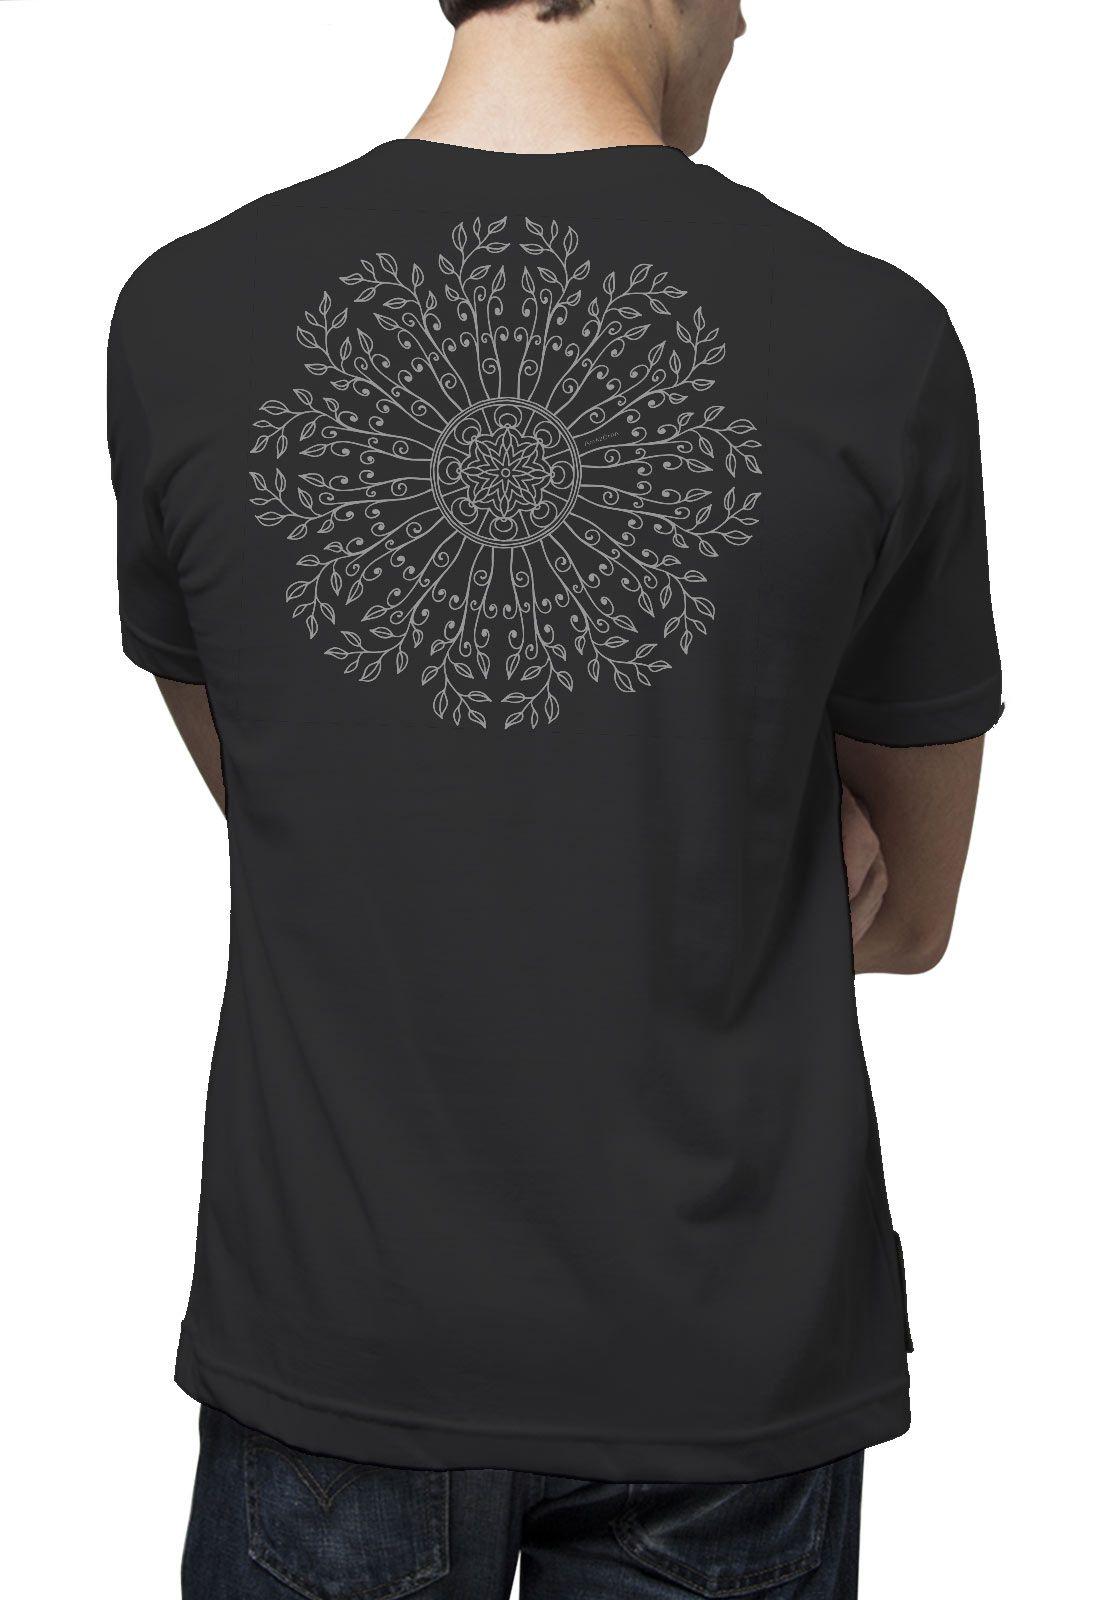 Camiseta Amazônia Mandala Planta - Preto